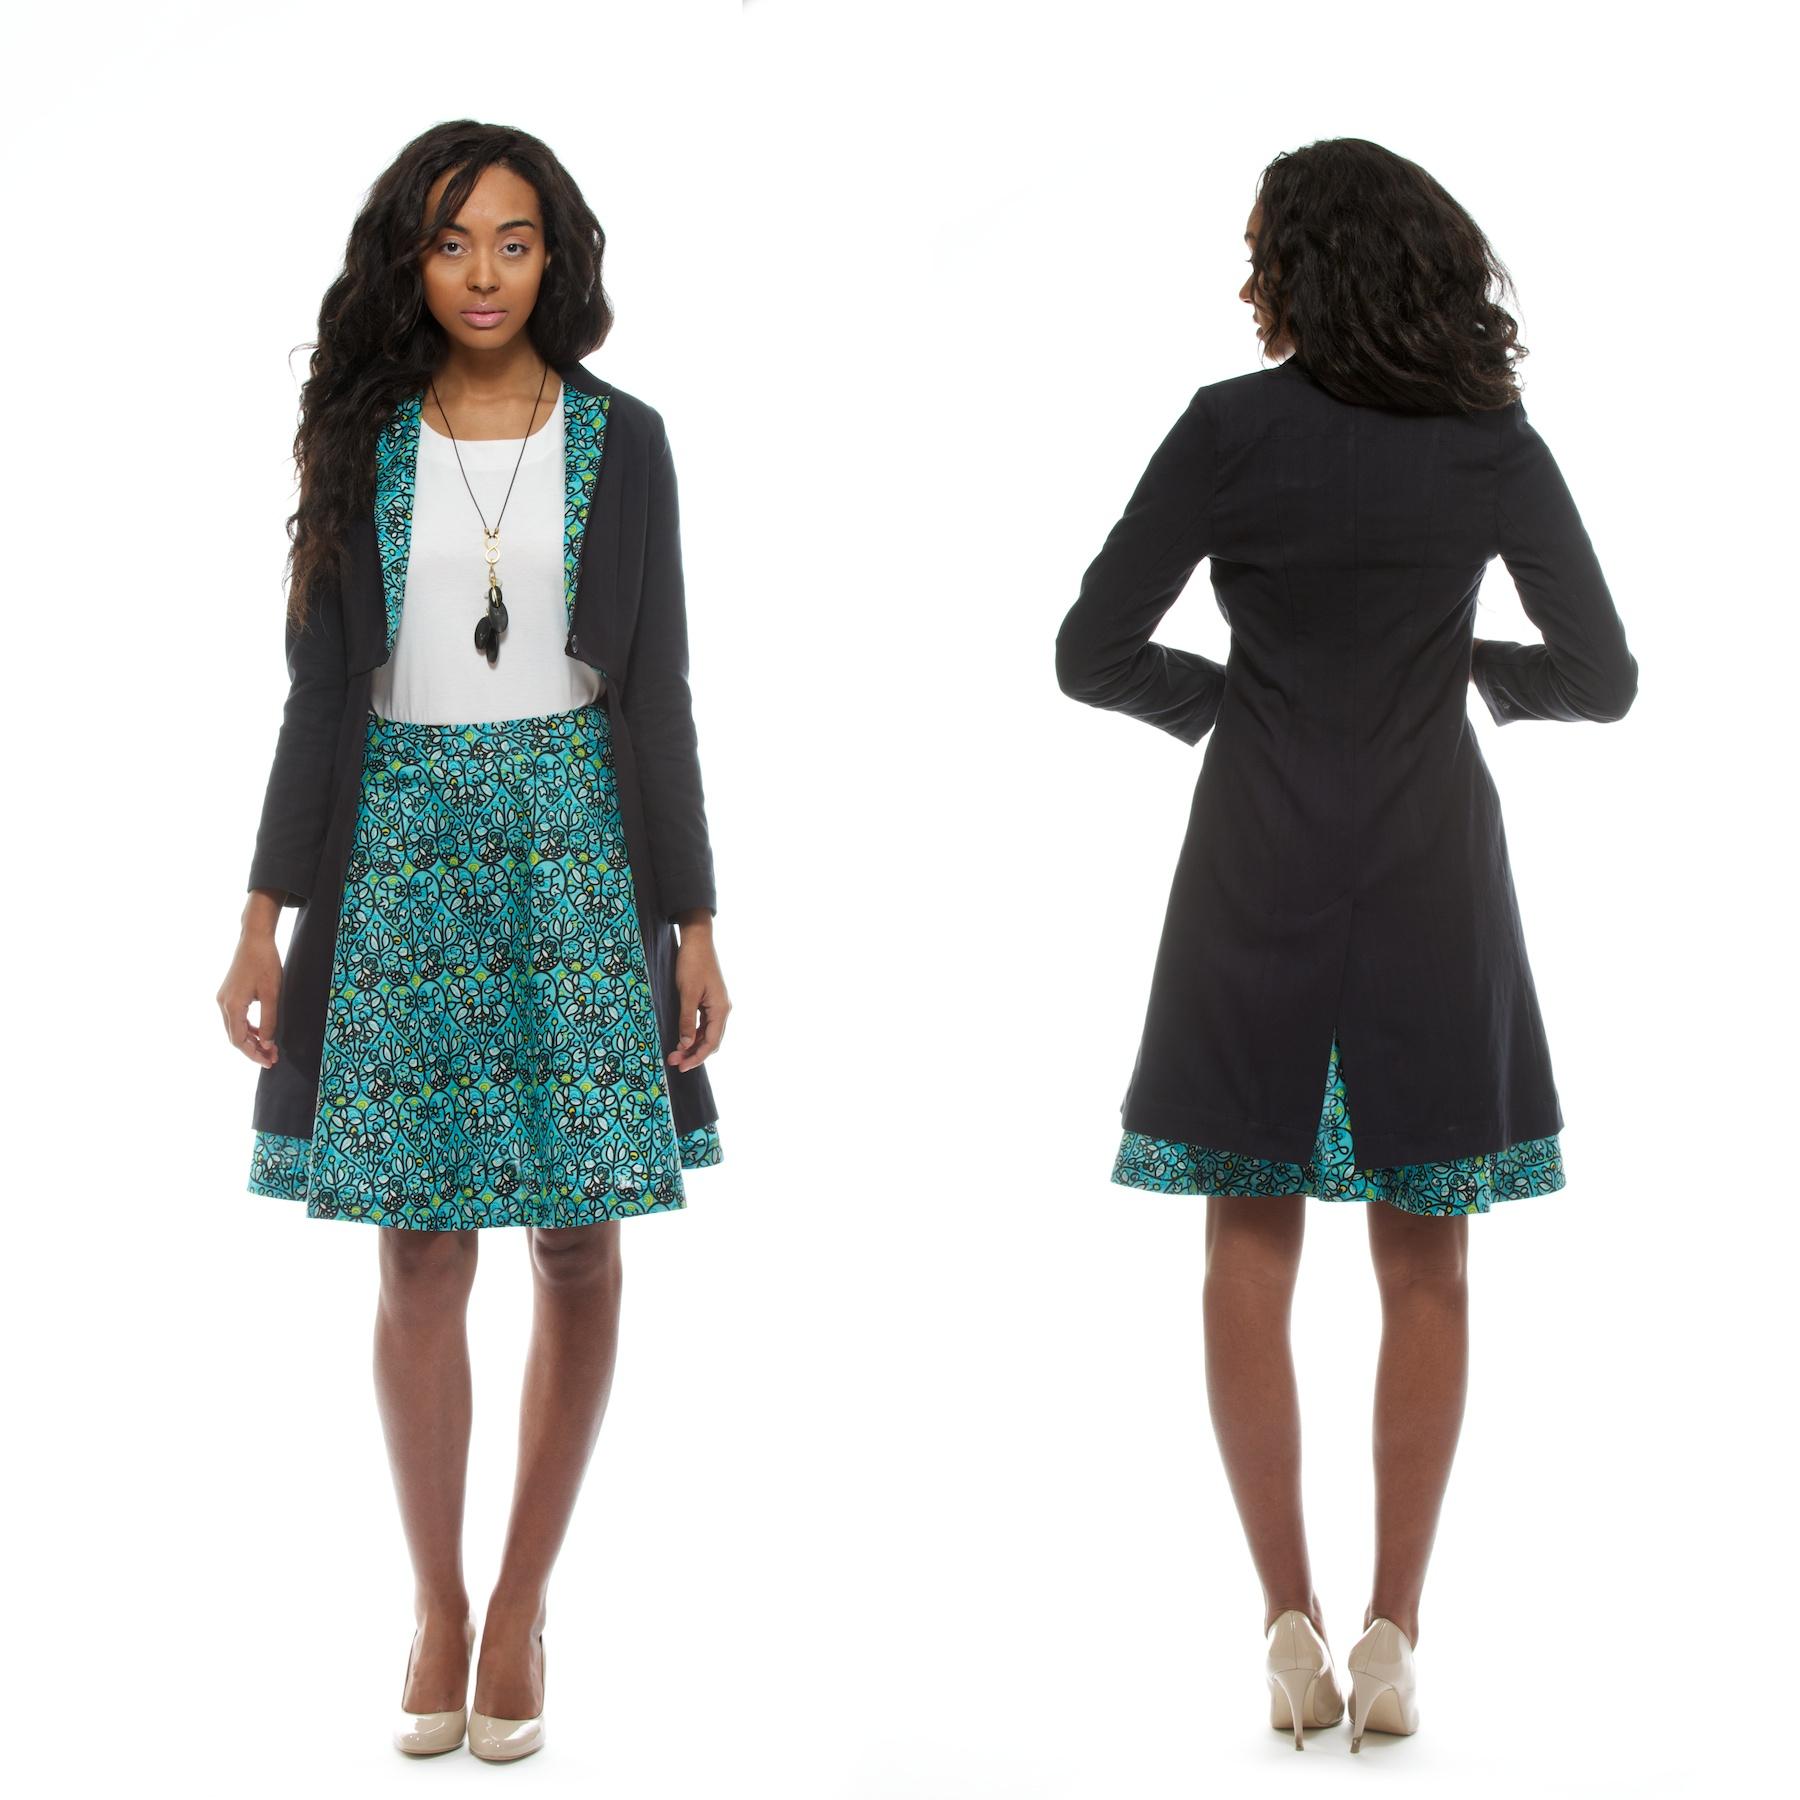 Evarlyne Coat with Lucy Skirt 1.jpg